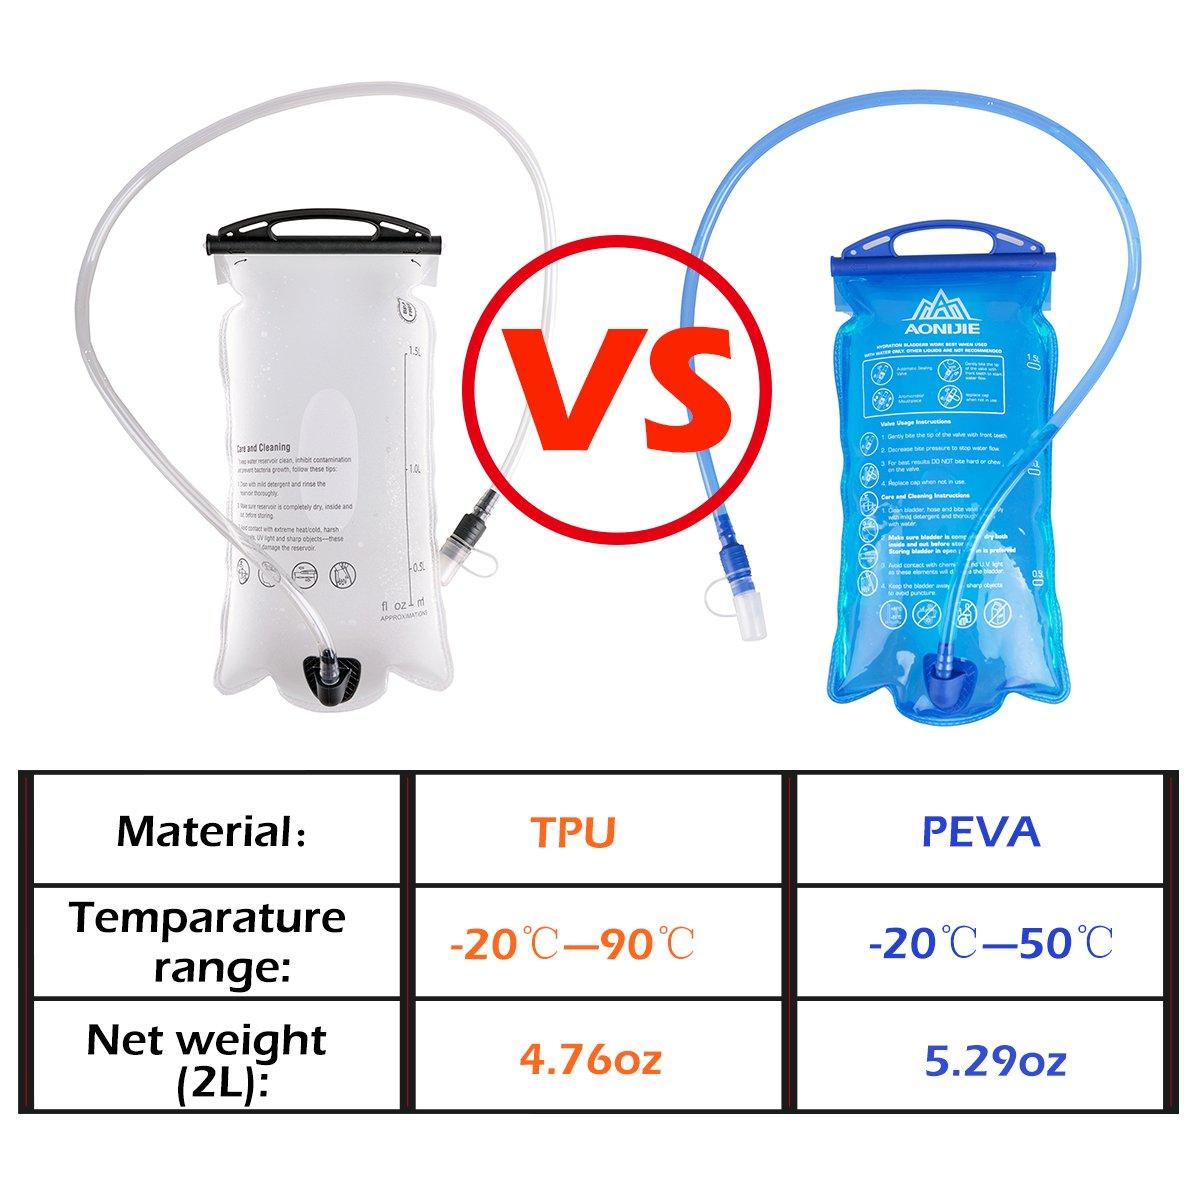 TRIWONDER 1.5-2-3L depósito de Agua de vejiga de hidratación Libre de BPA para Montar en Bicicleta Senderismo Mochila de Camping (2L / 70oz (TPU) - Blanco): ...